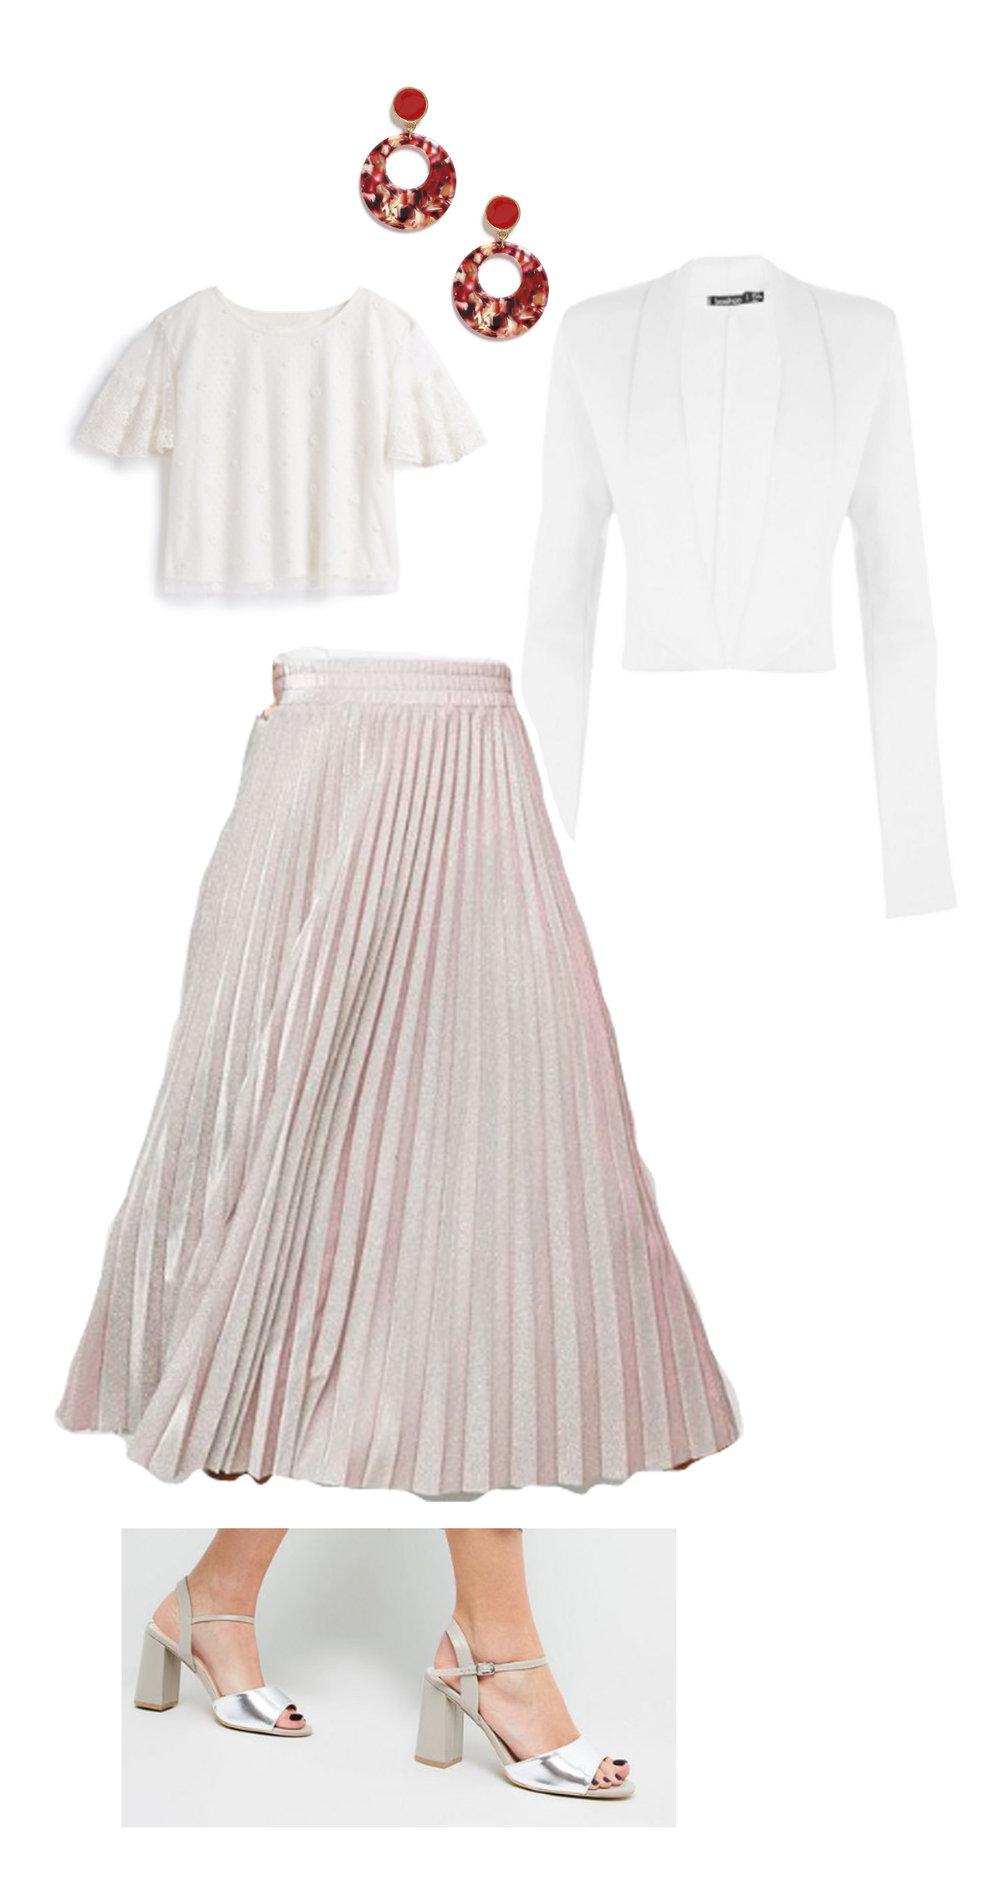 - Primark Earrings - £3.00Primark Shirt - £8.00Boohoo Blazer - £9.12New Look Skirt - £22.99New Look Heels - £22.99